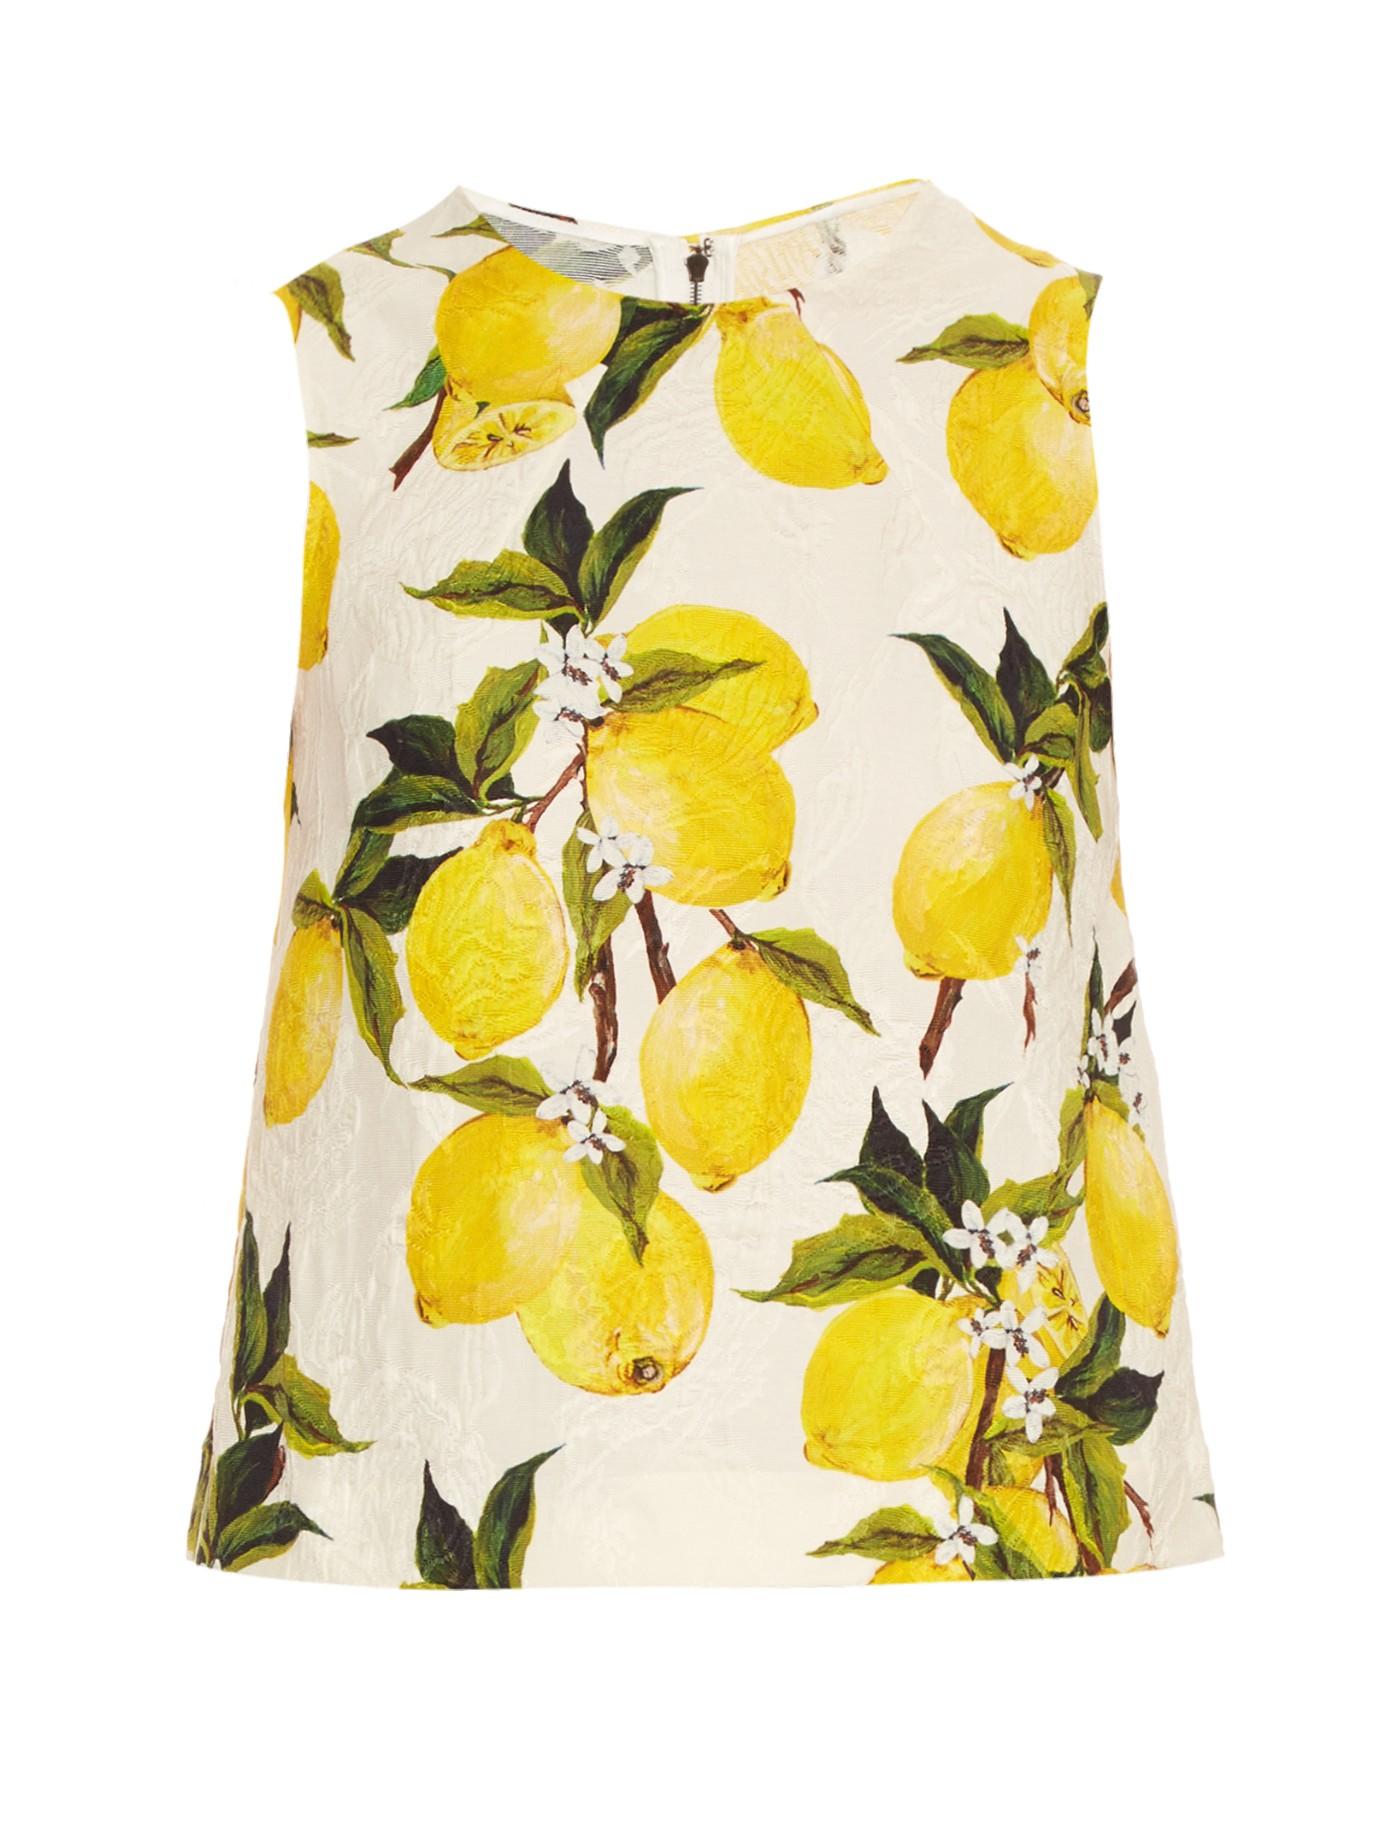 740f43330e8 Dolce   Gabbana Lemon-print Floral-brocade Top in Green - Lyst